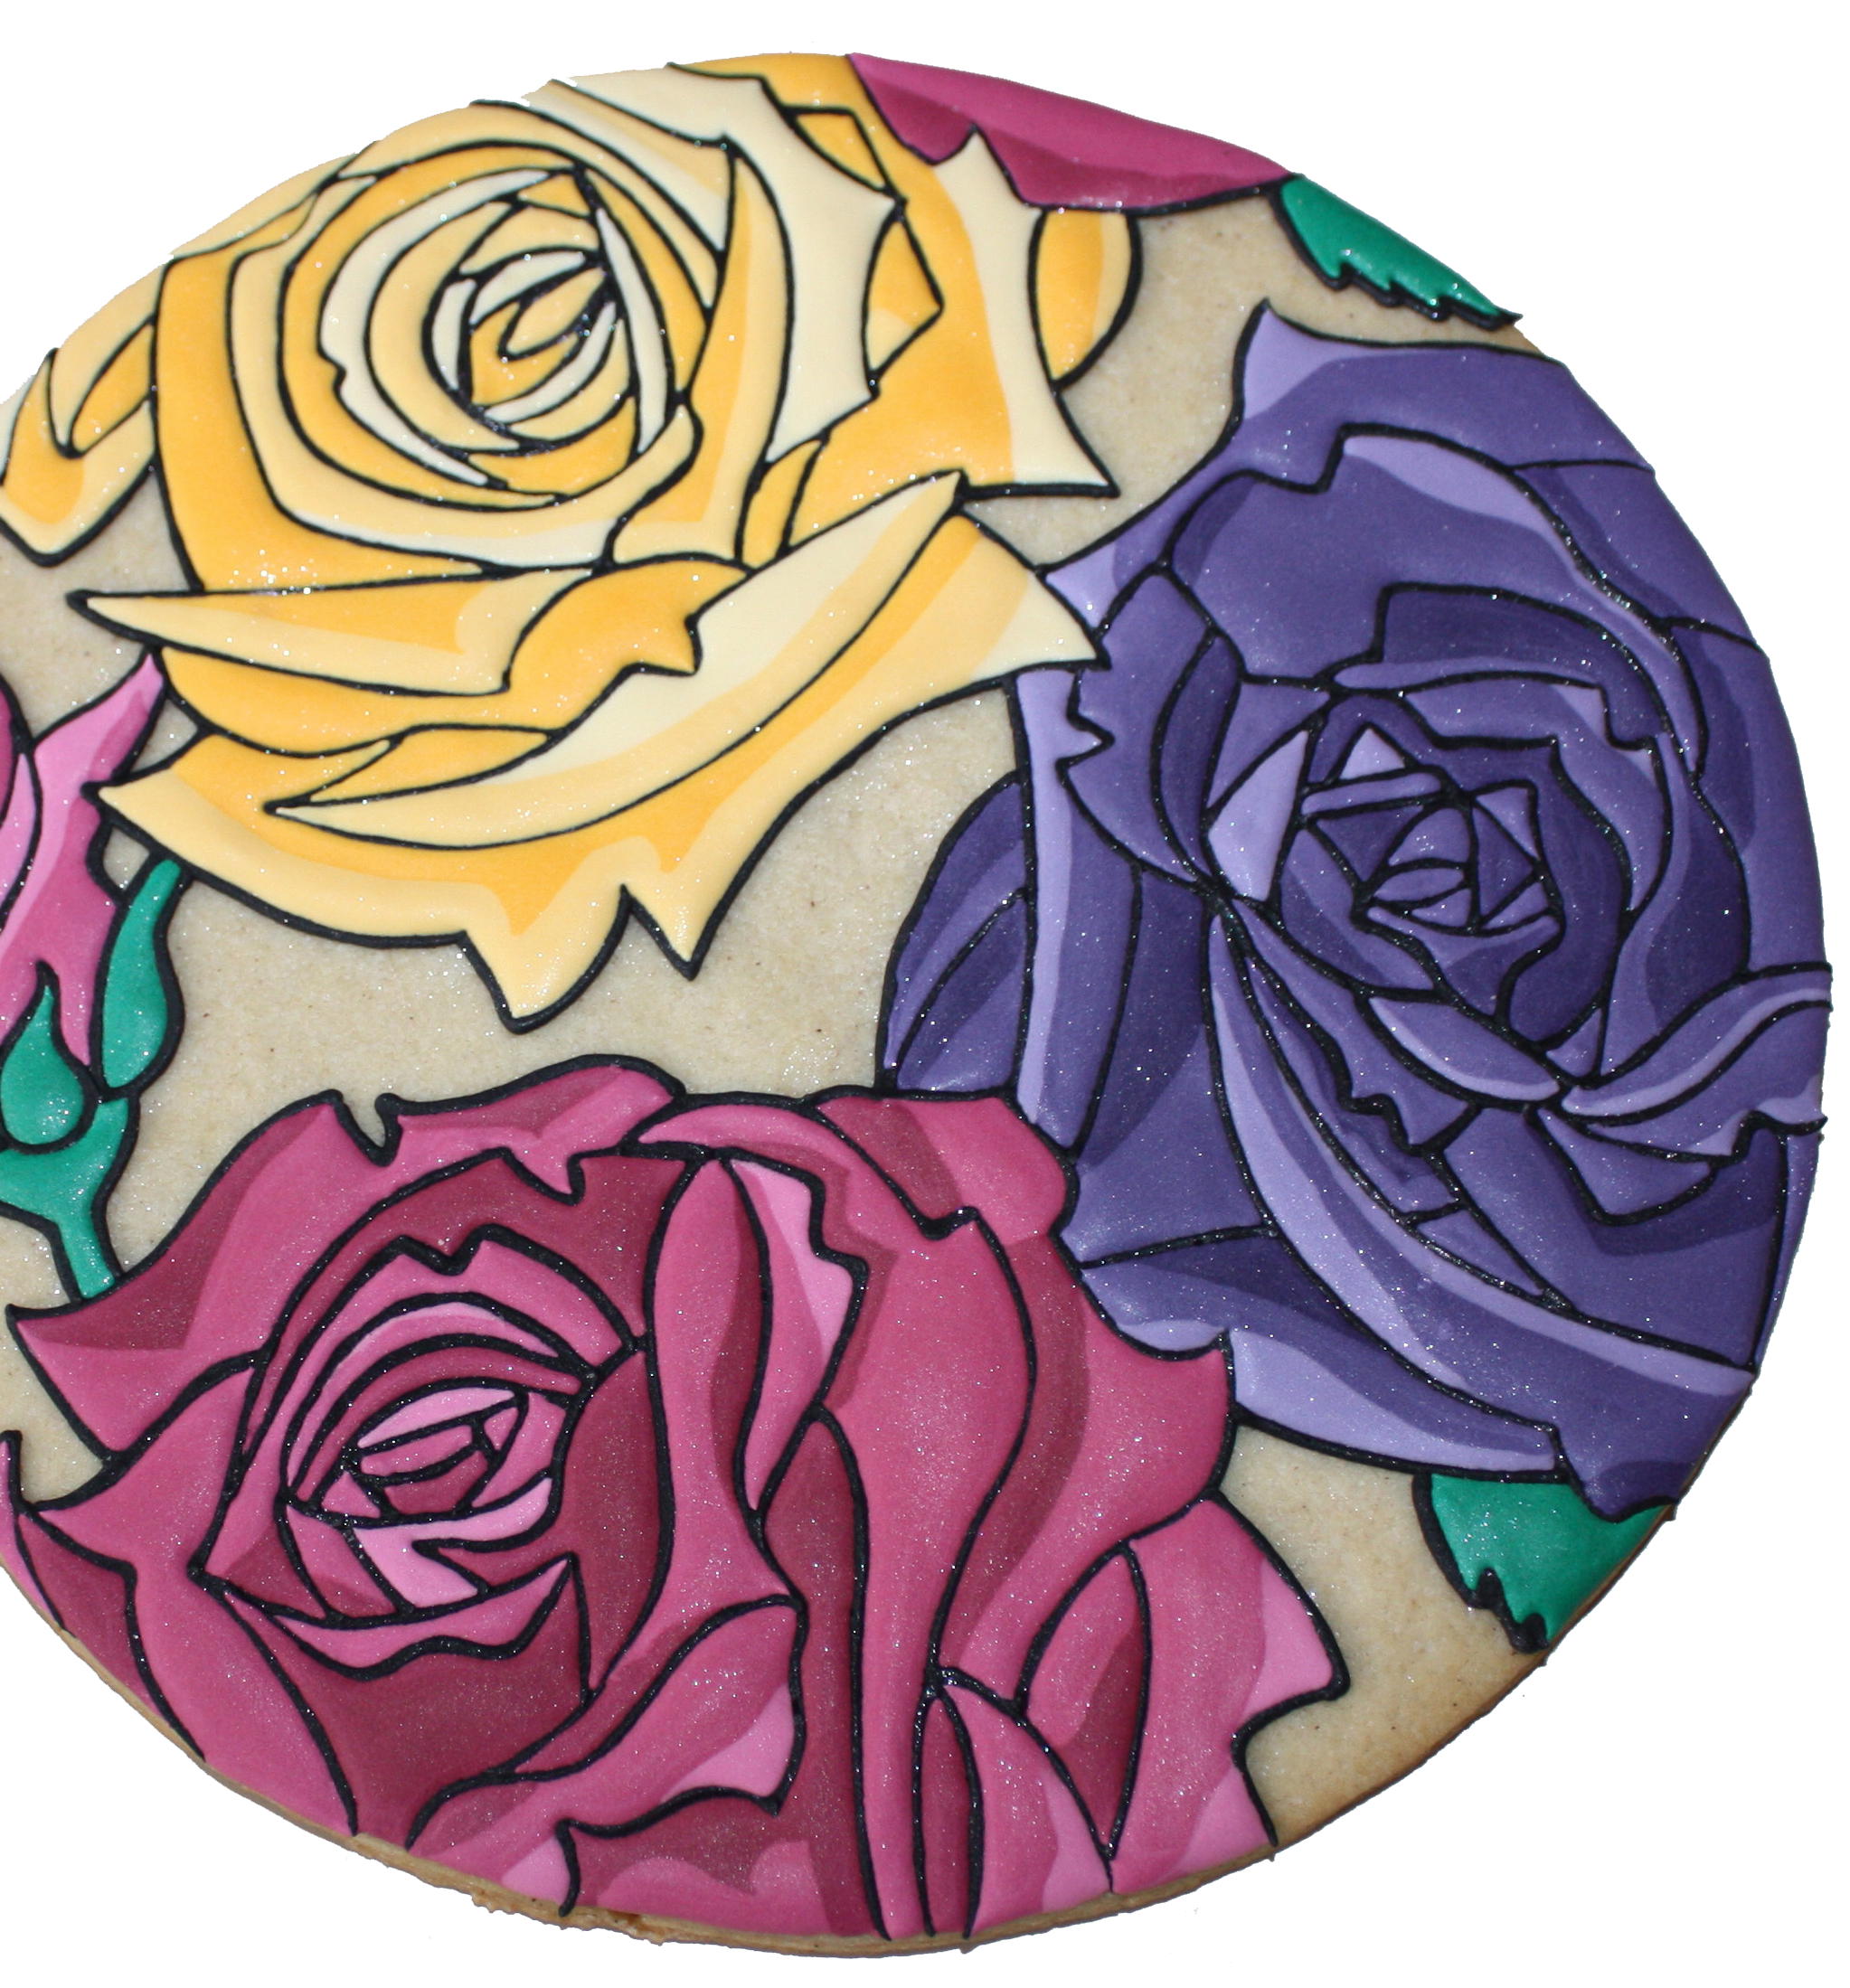 Large Roses copy 2 copy.png